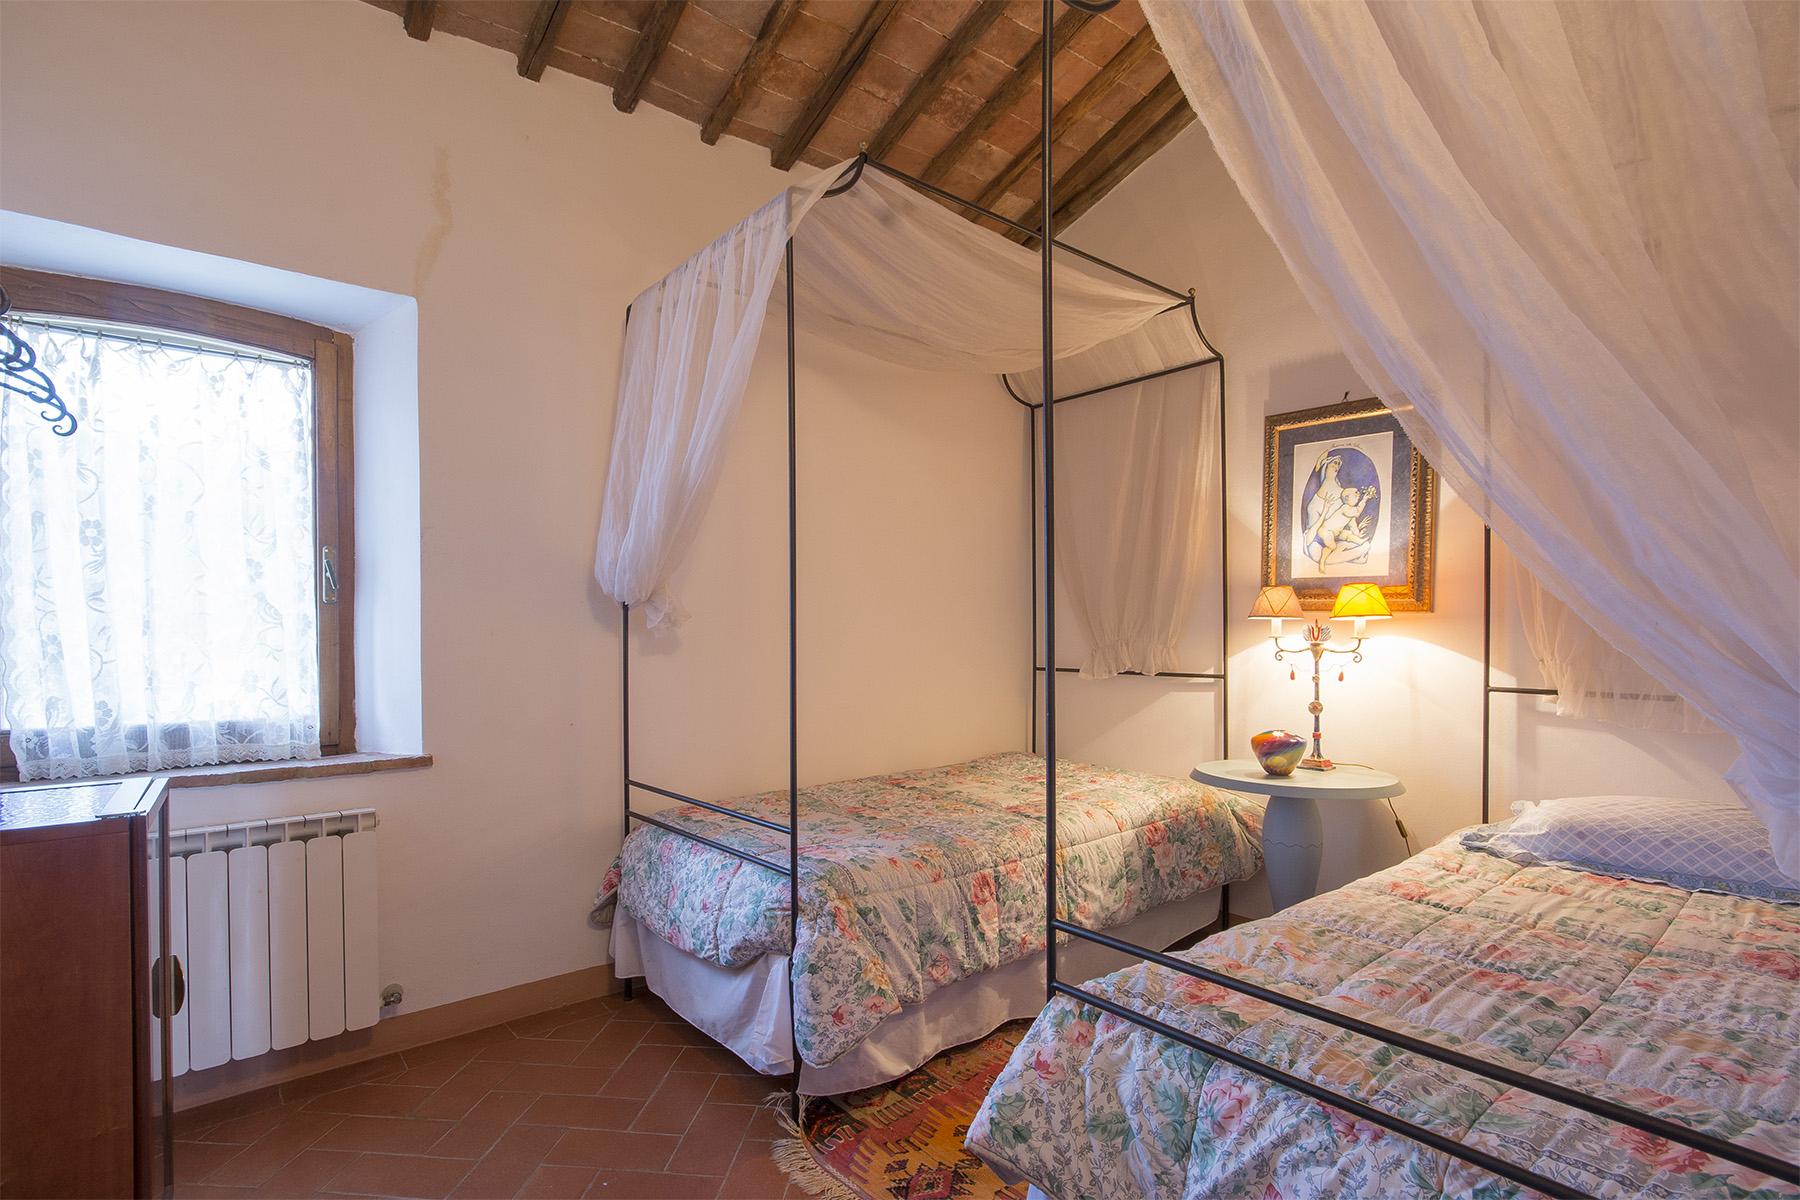 Casa indipendente in Vendita a Pienza: 5 locali, 400 mq - Foto 23